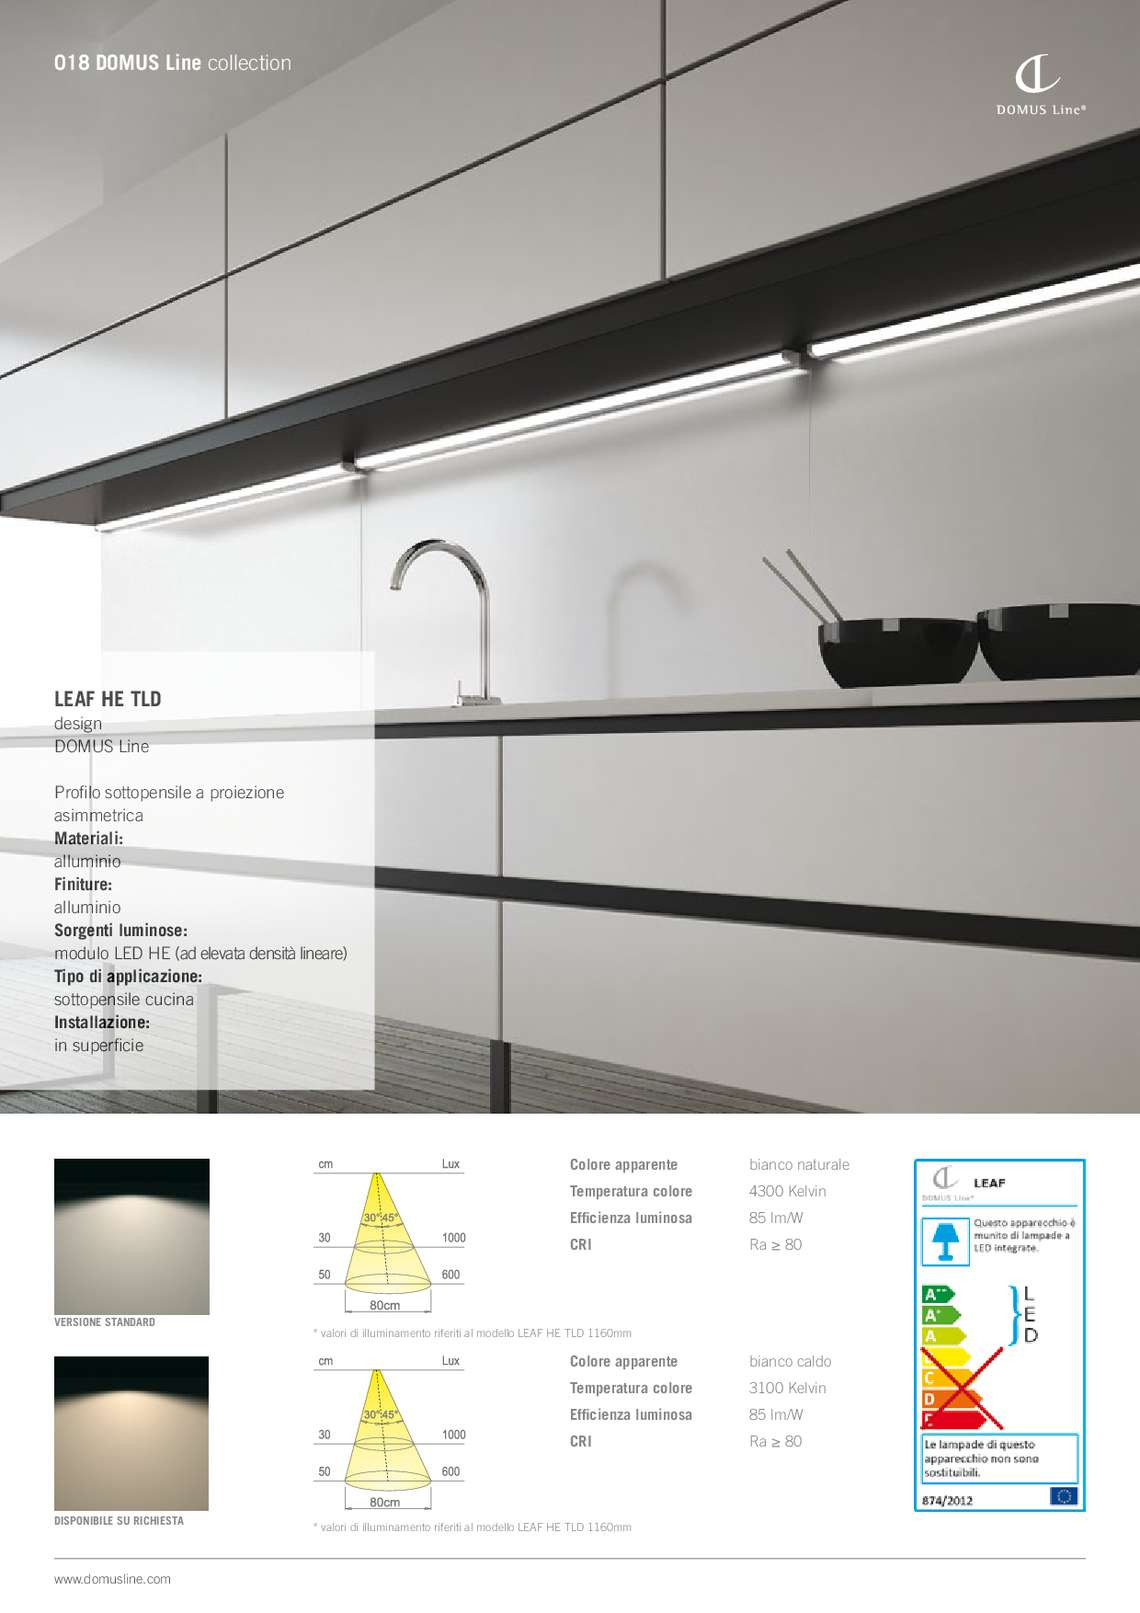 domus-line-illuminazione_26_018.jpg